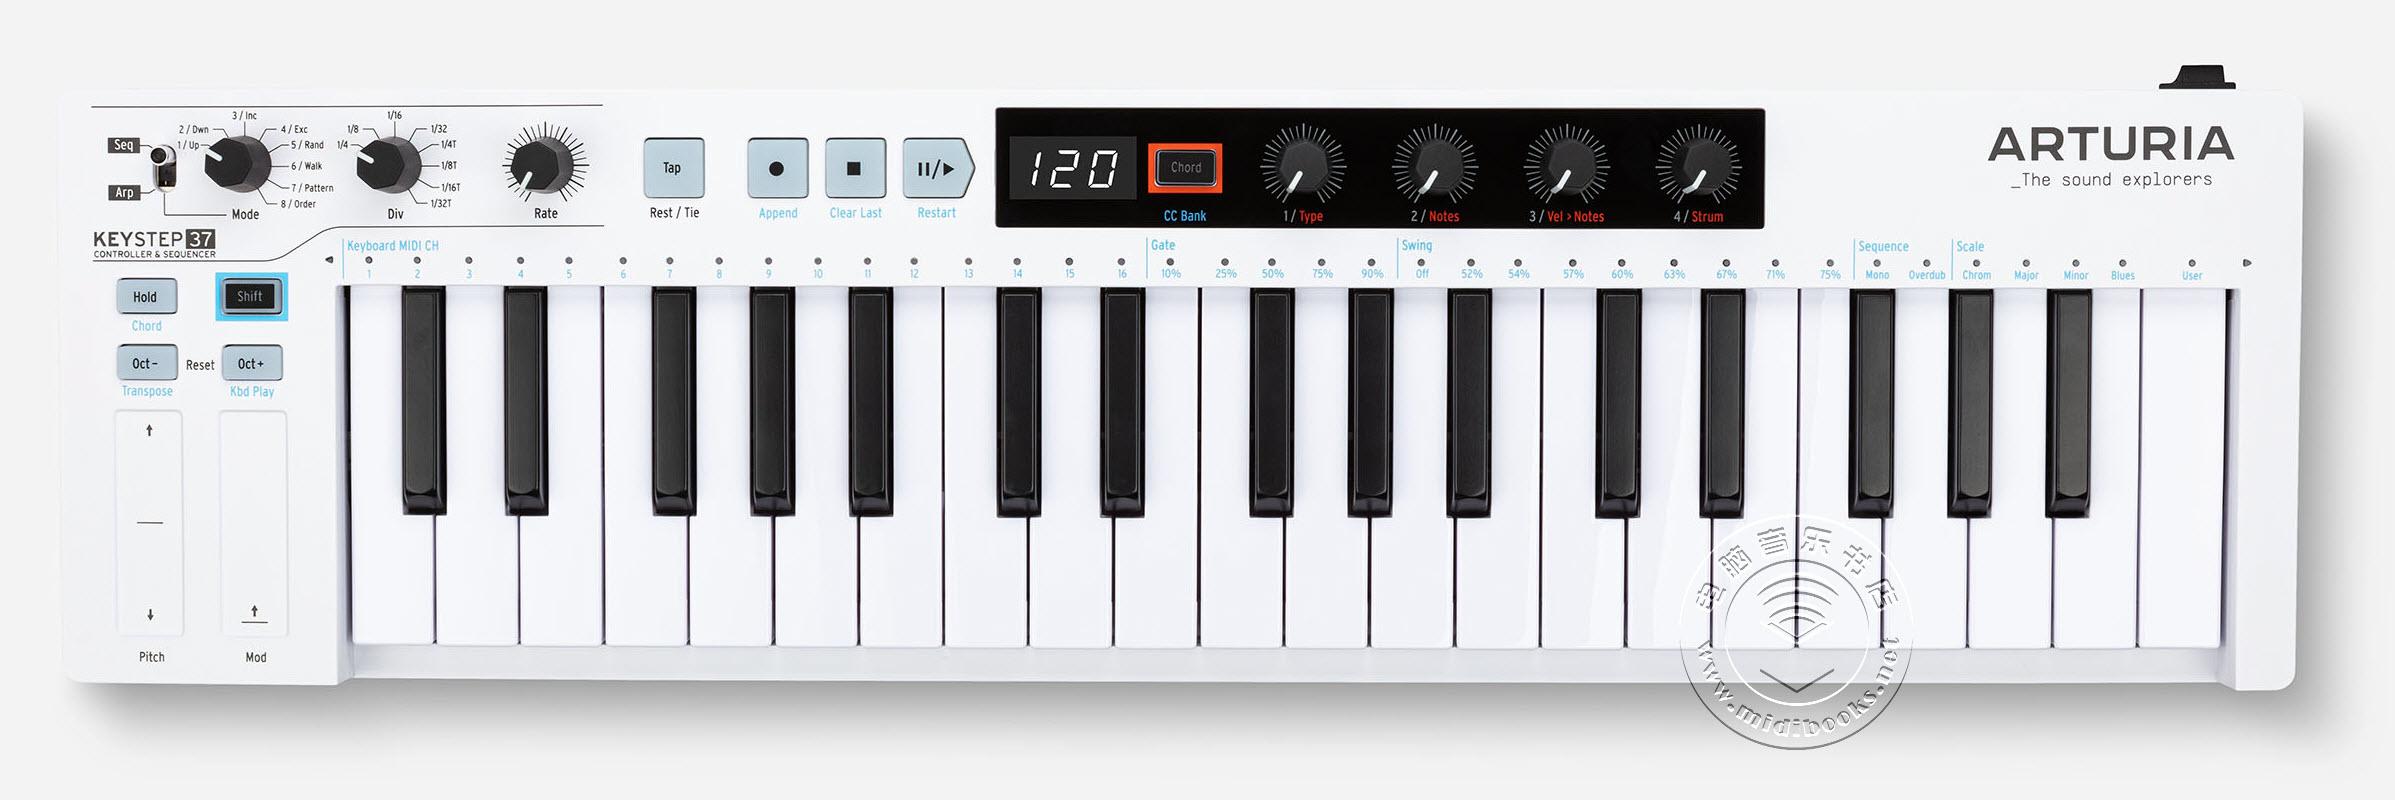 ARTURIA 发布 KeyStep 37 MIDI键盘控制器(视频)